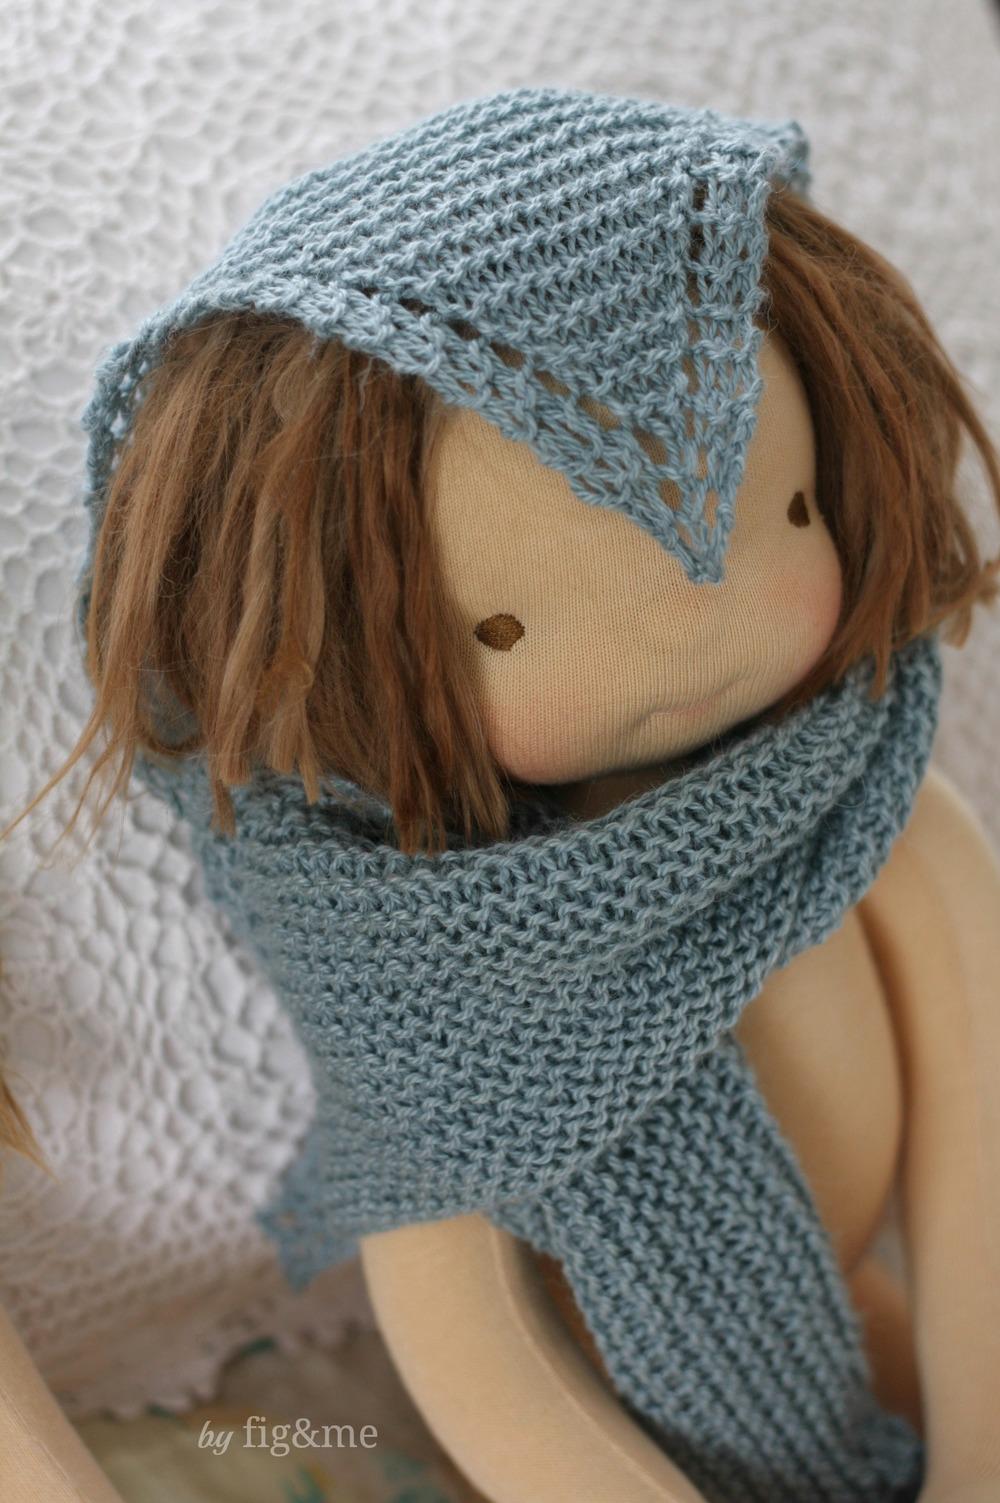 Baby Alpaca and silk shawl, by Fig&me.